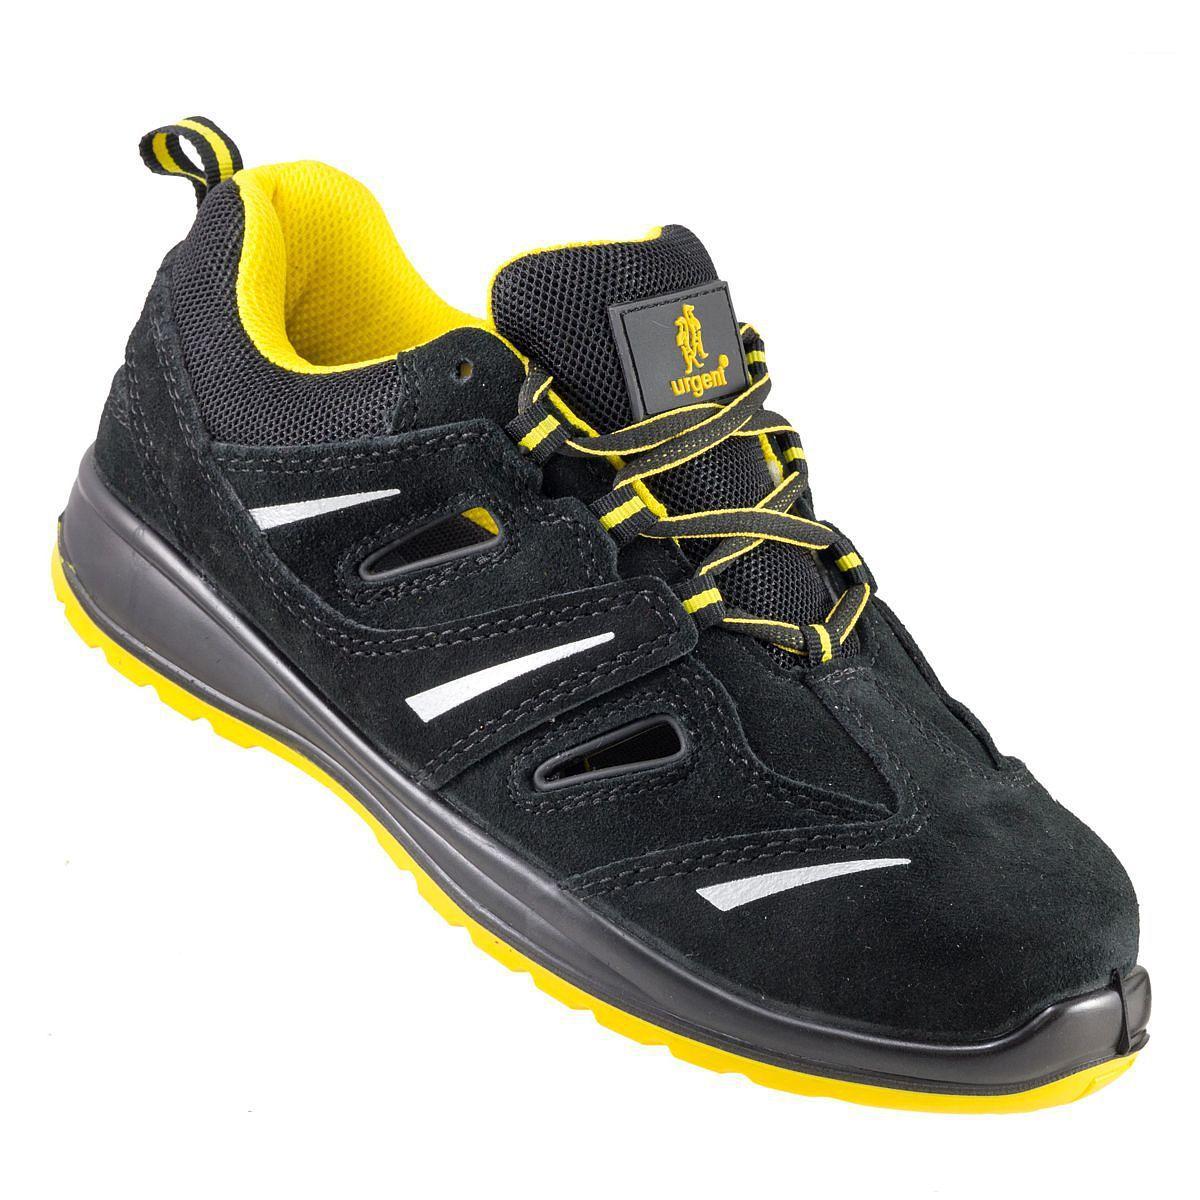 Кроссовки  206 S1 с металлическим носком. Urgent